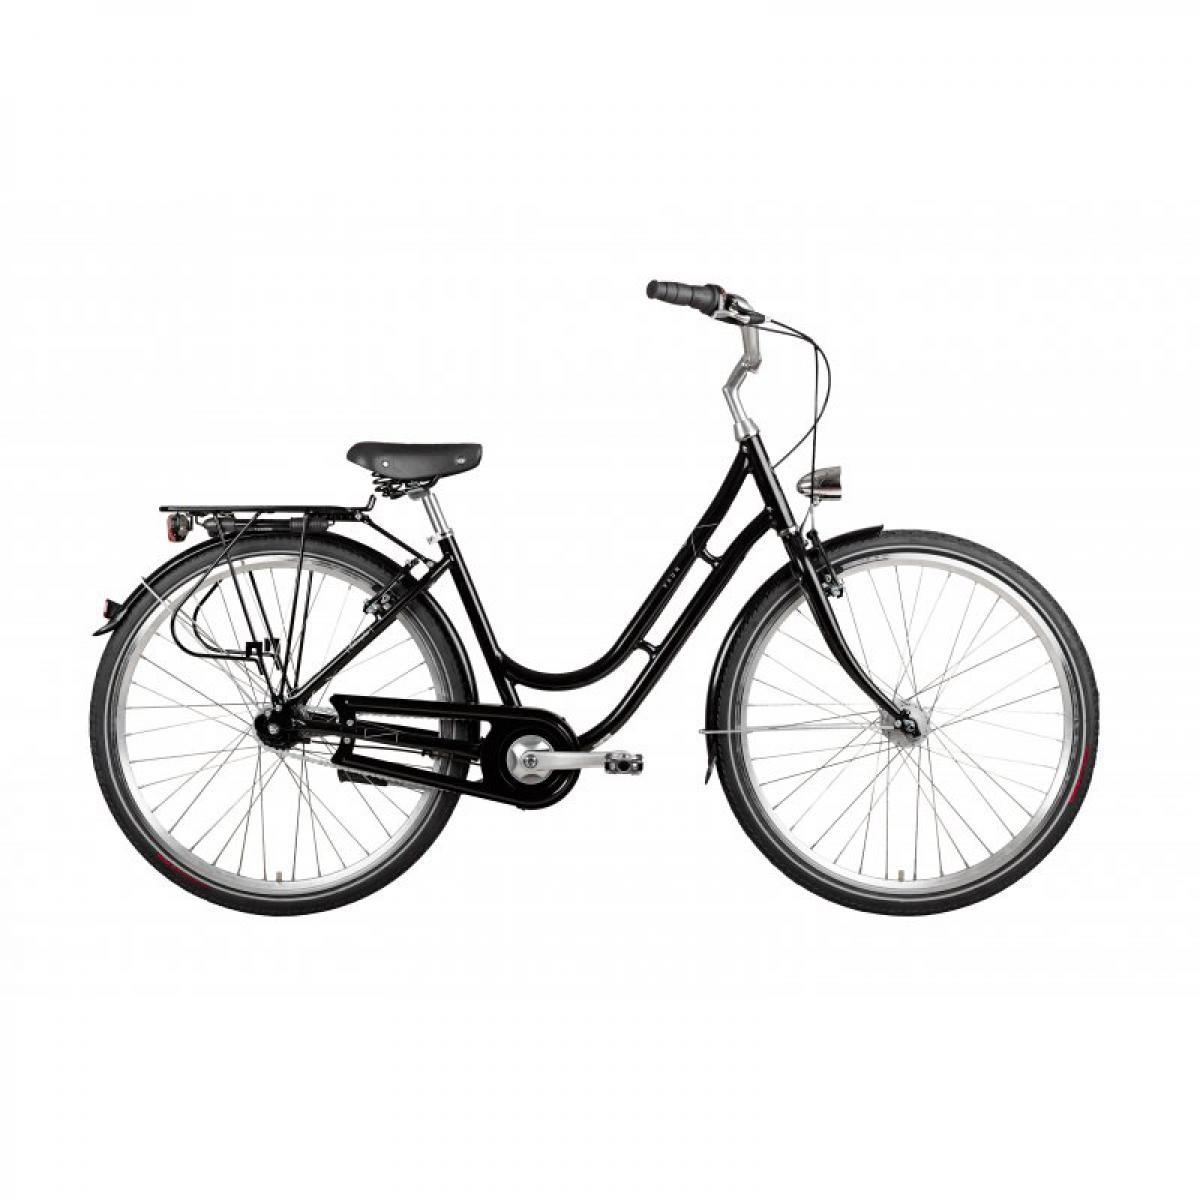 28 zoll alu vaun damen city fahrrad citybike shimano. Black Bedroom Furniture Sets. Home Design Ideas